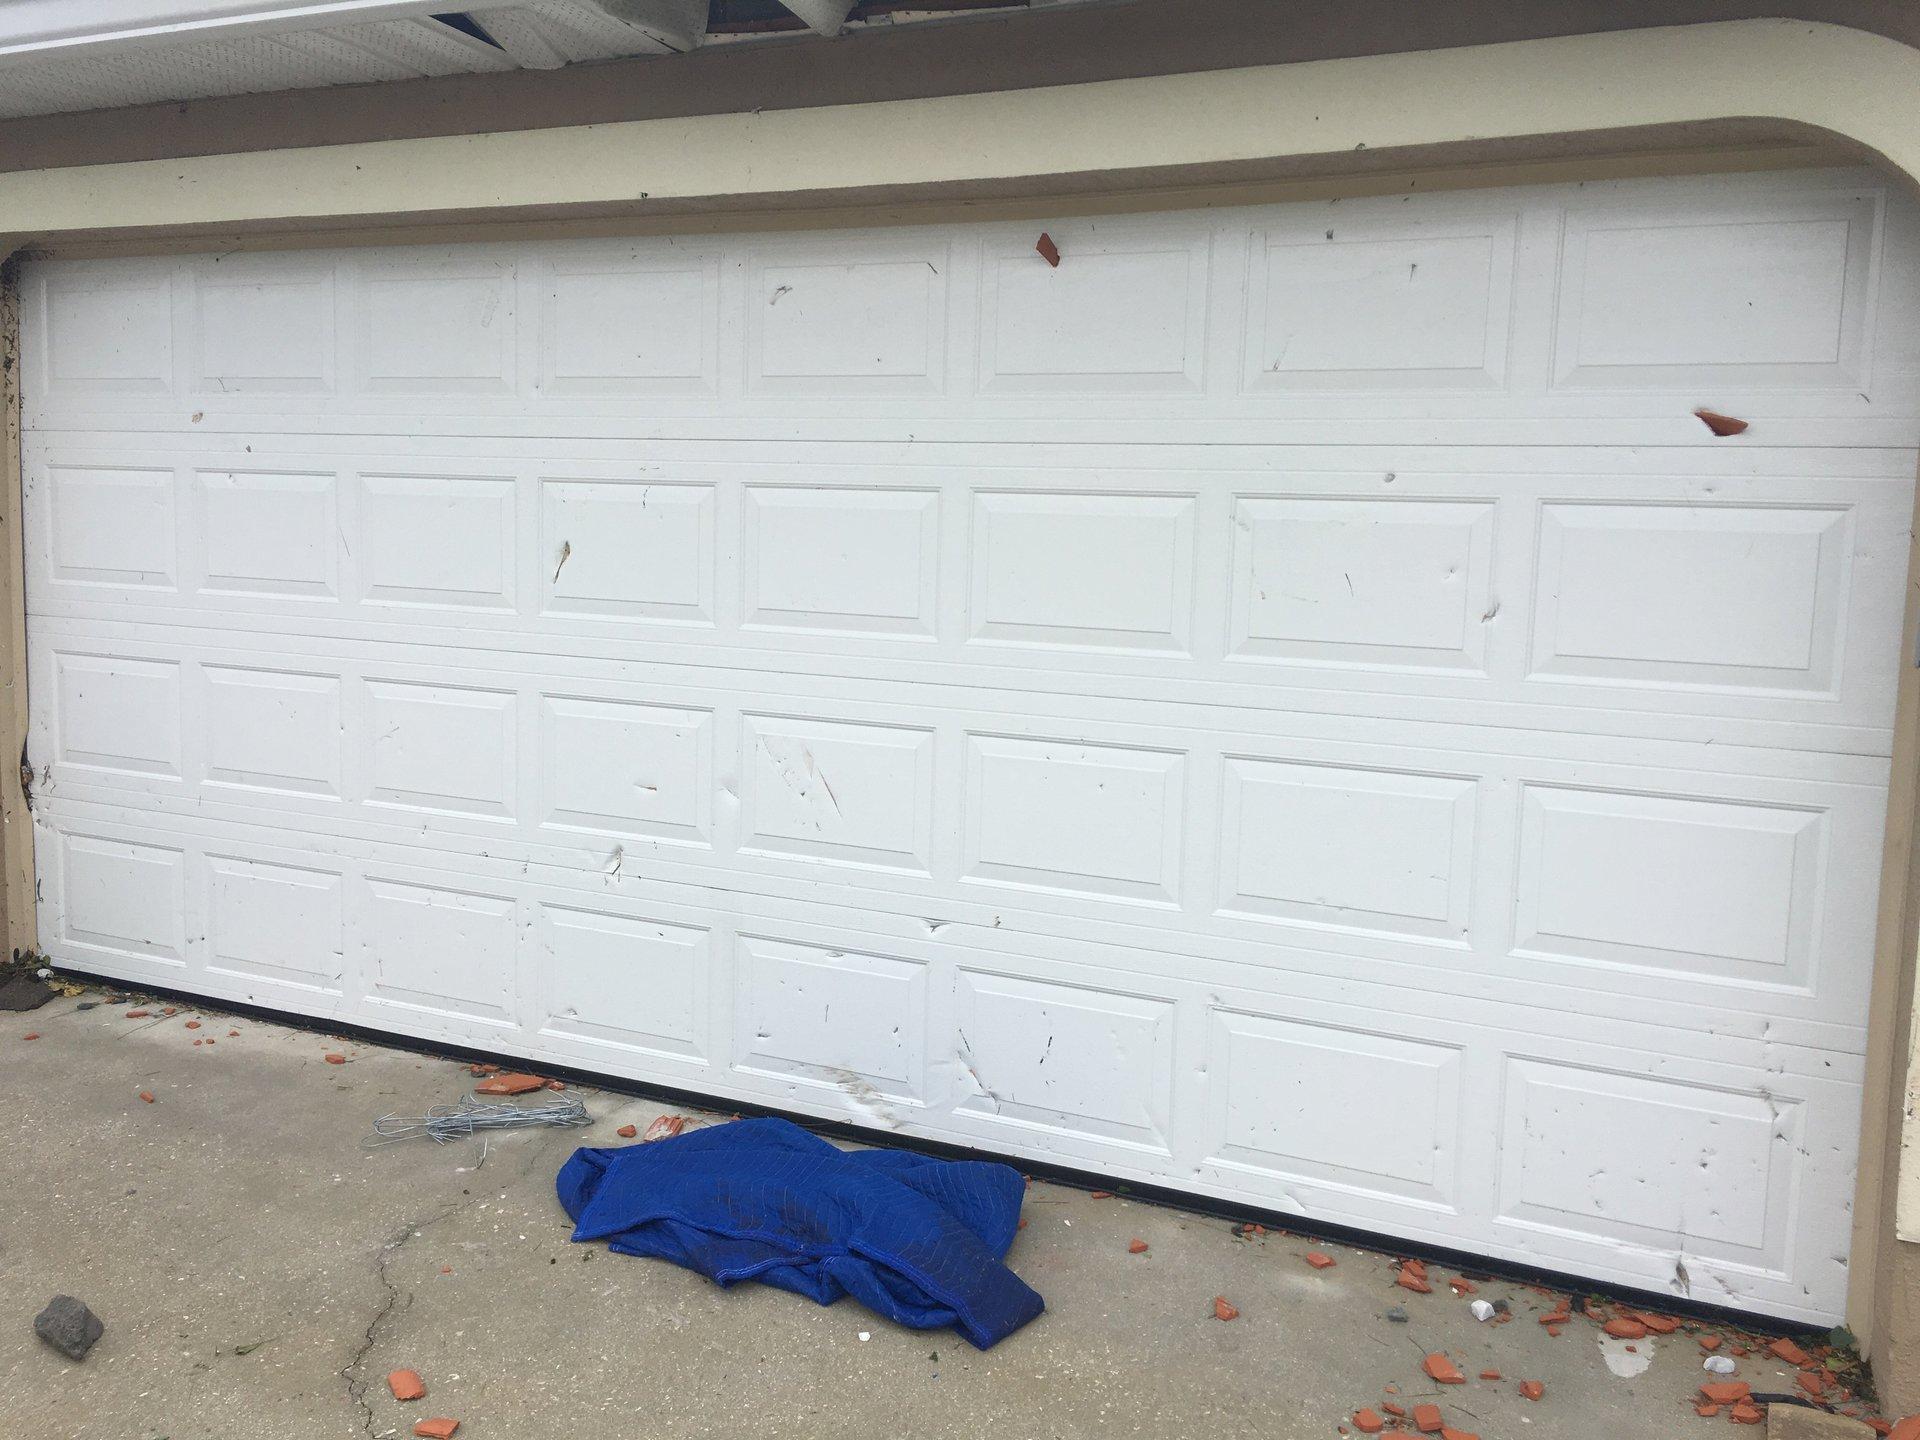 Tips for selecting a garage door haas door products laugh at ef 2 tornado rubansaba